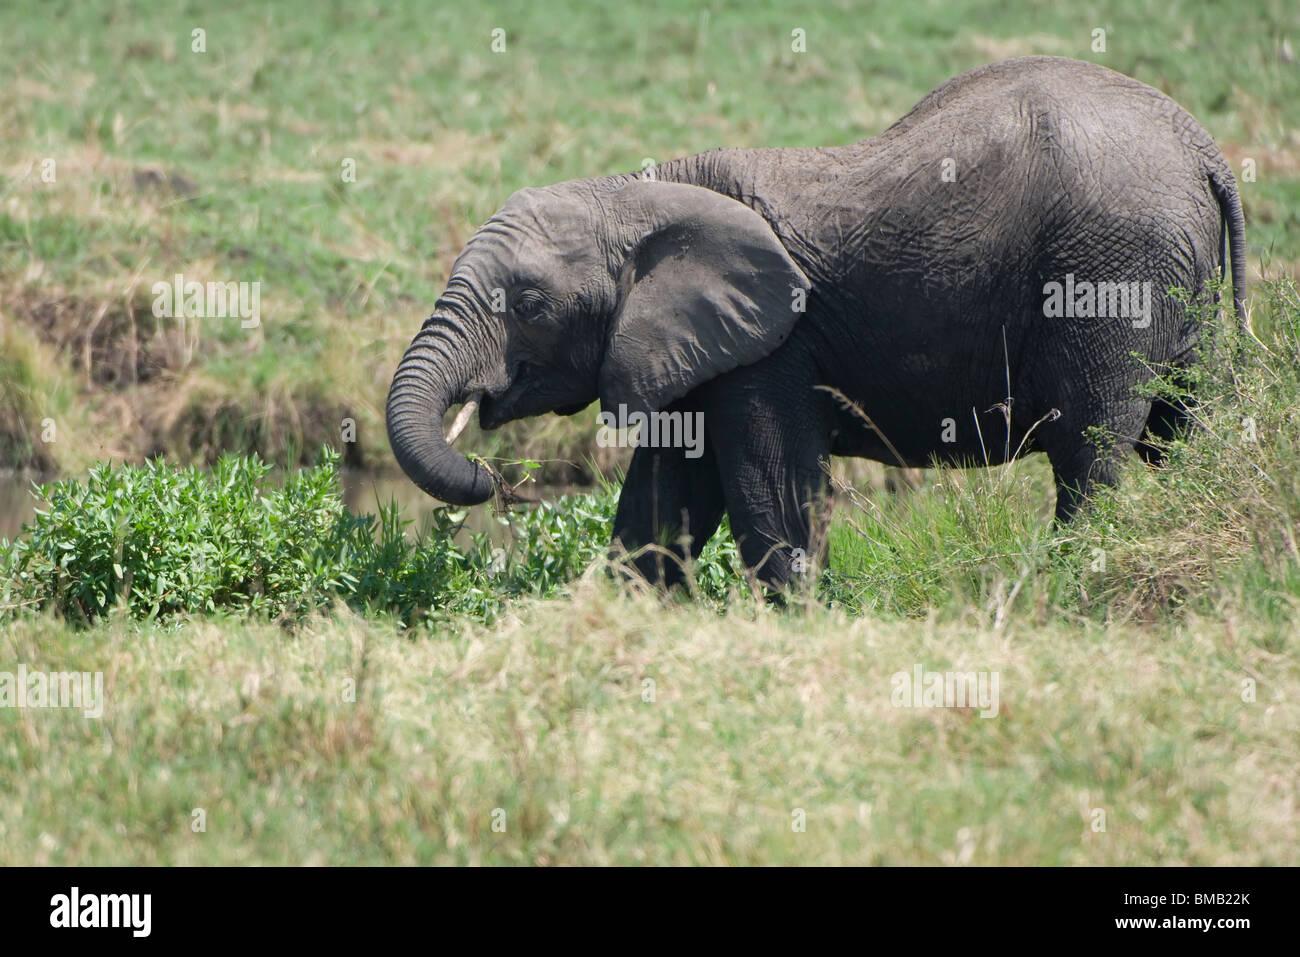 Young African Elephant, Loxodonta africana, Masai Mara, Kenya, Africa - Stock Image